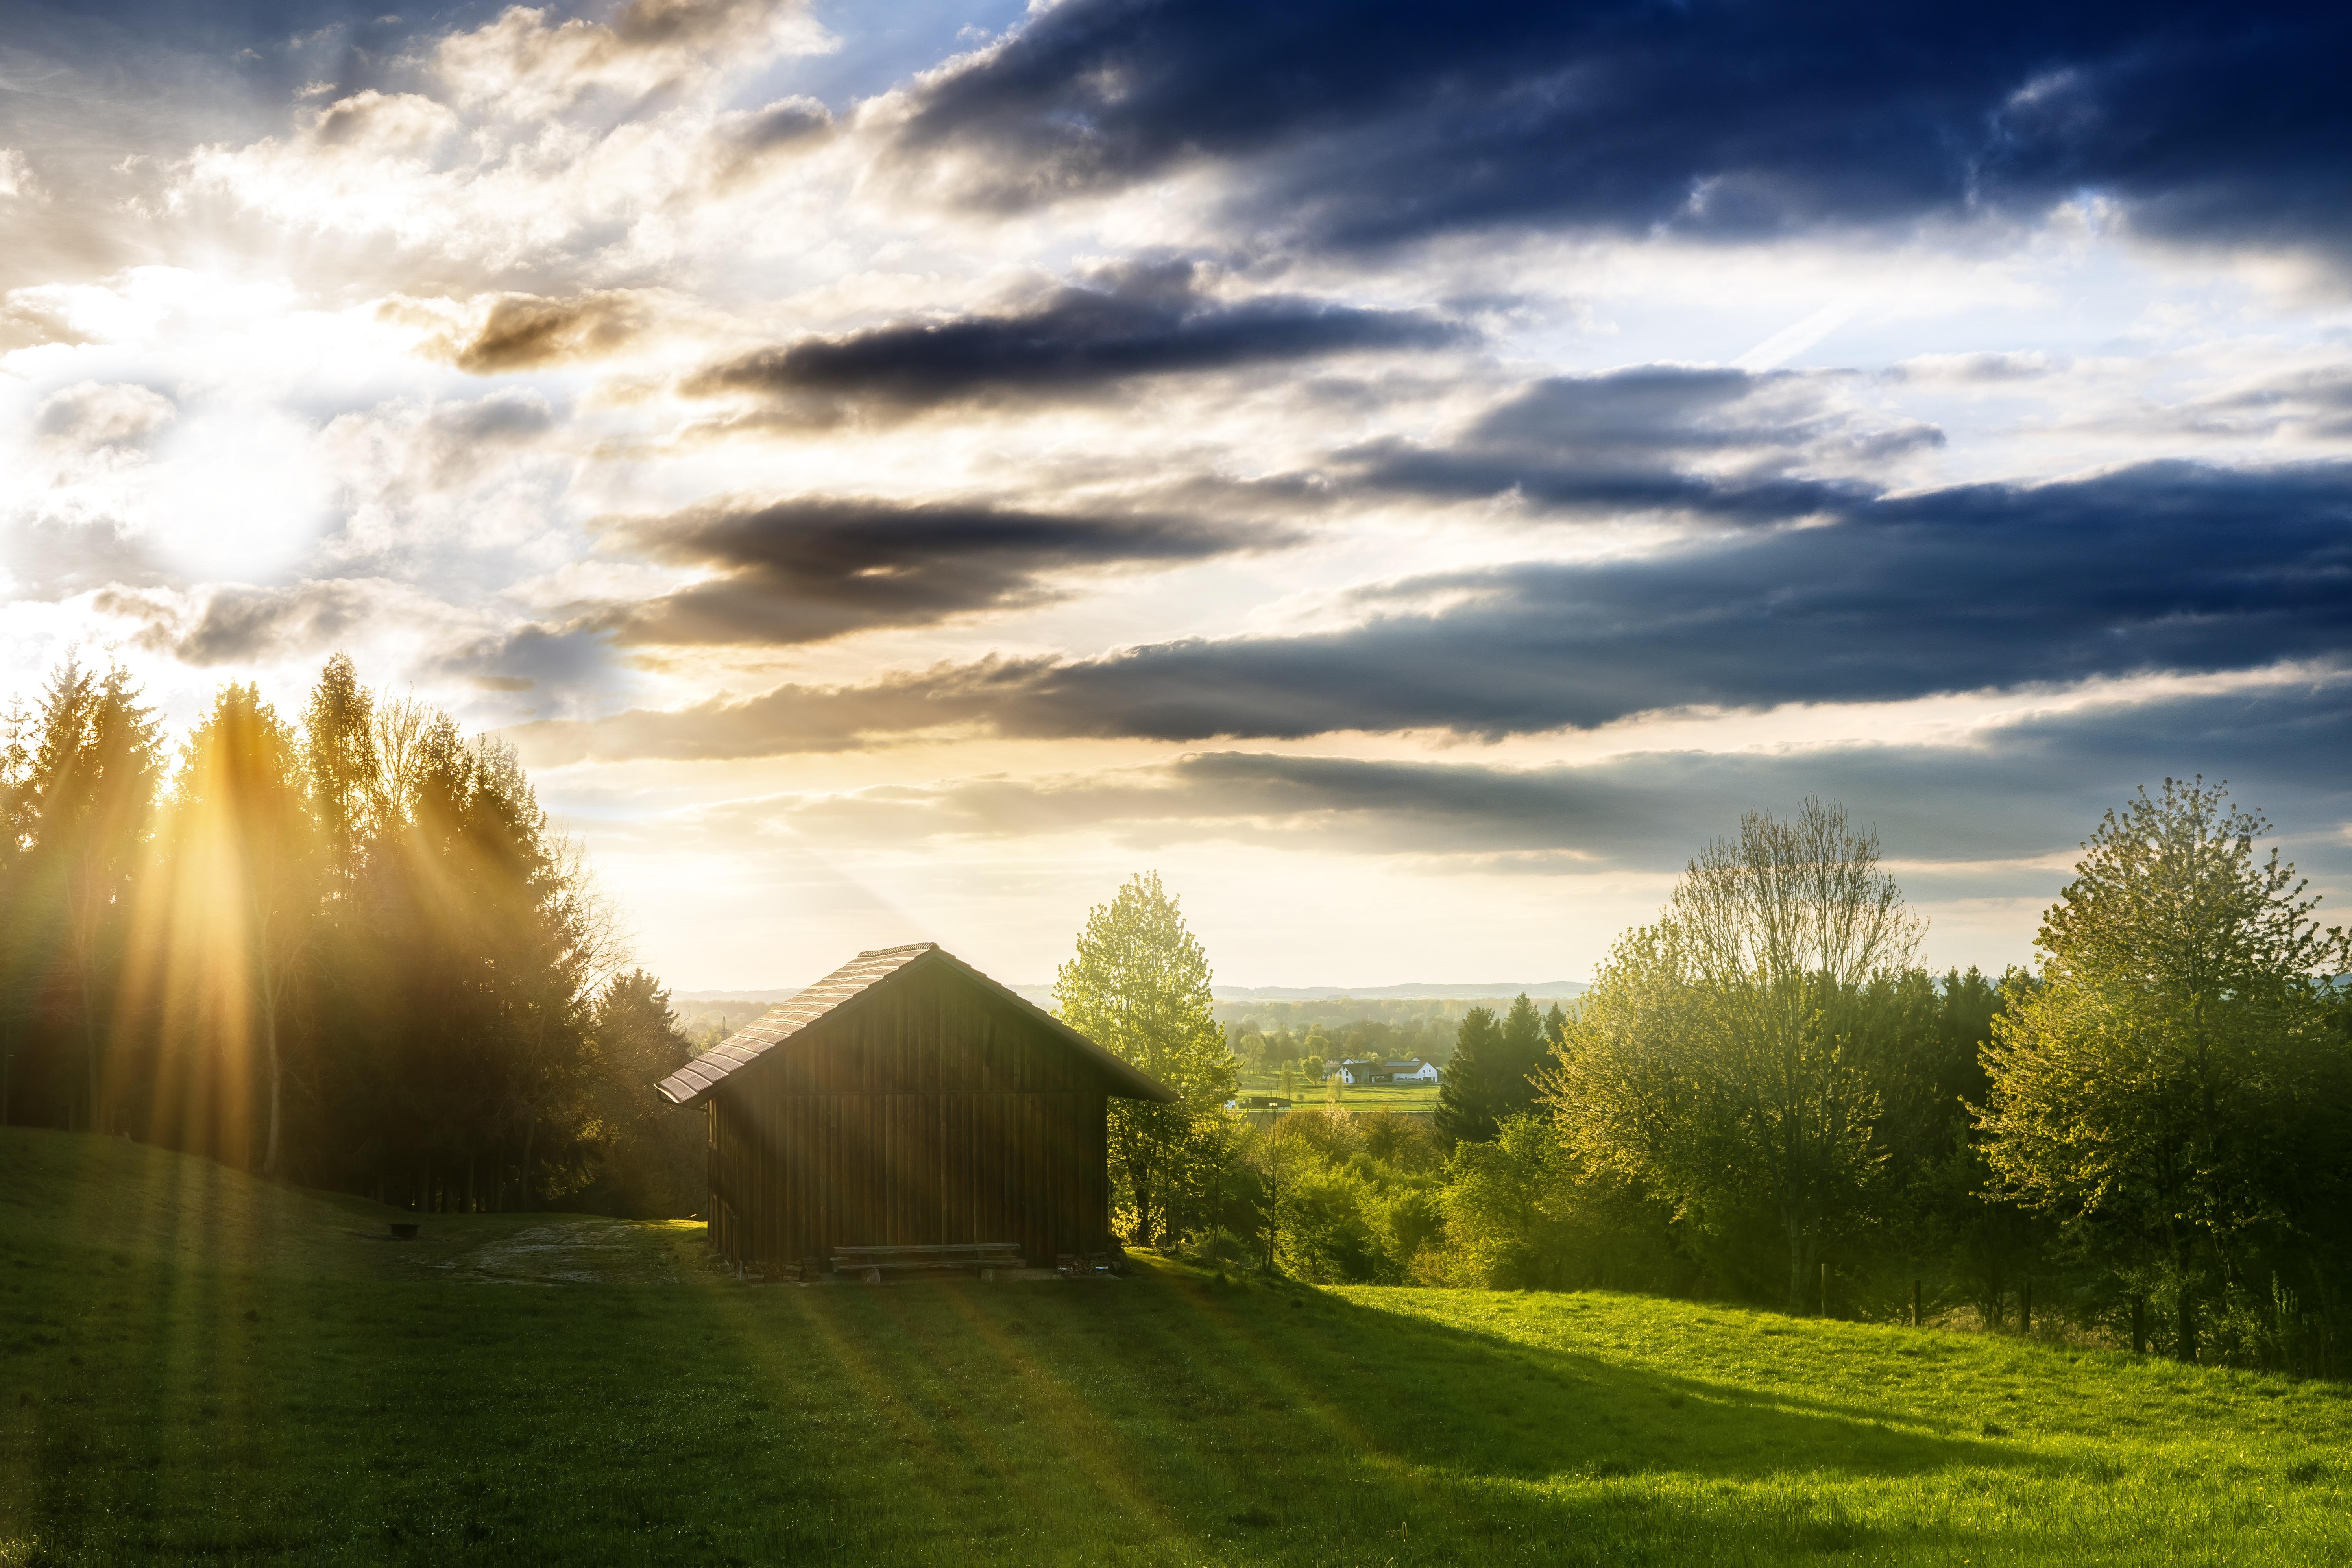 Free Images : Landscape, Tree, Nature, Grass, Horizon, Cloud, Sun, Sunrise,  Sunset, Field, Lawn, Meadow, Prairie, Sunlight, Morning, Hill, Flower,  Building, ...